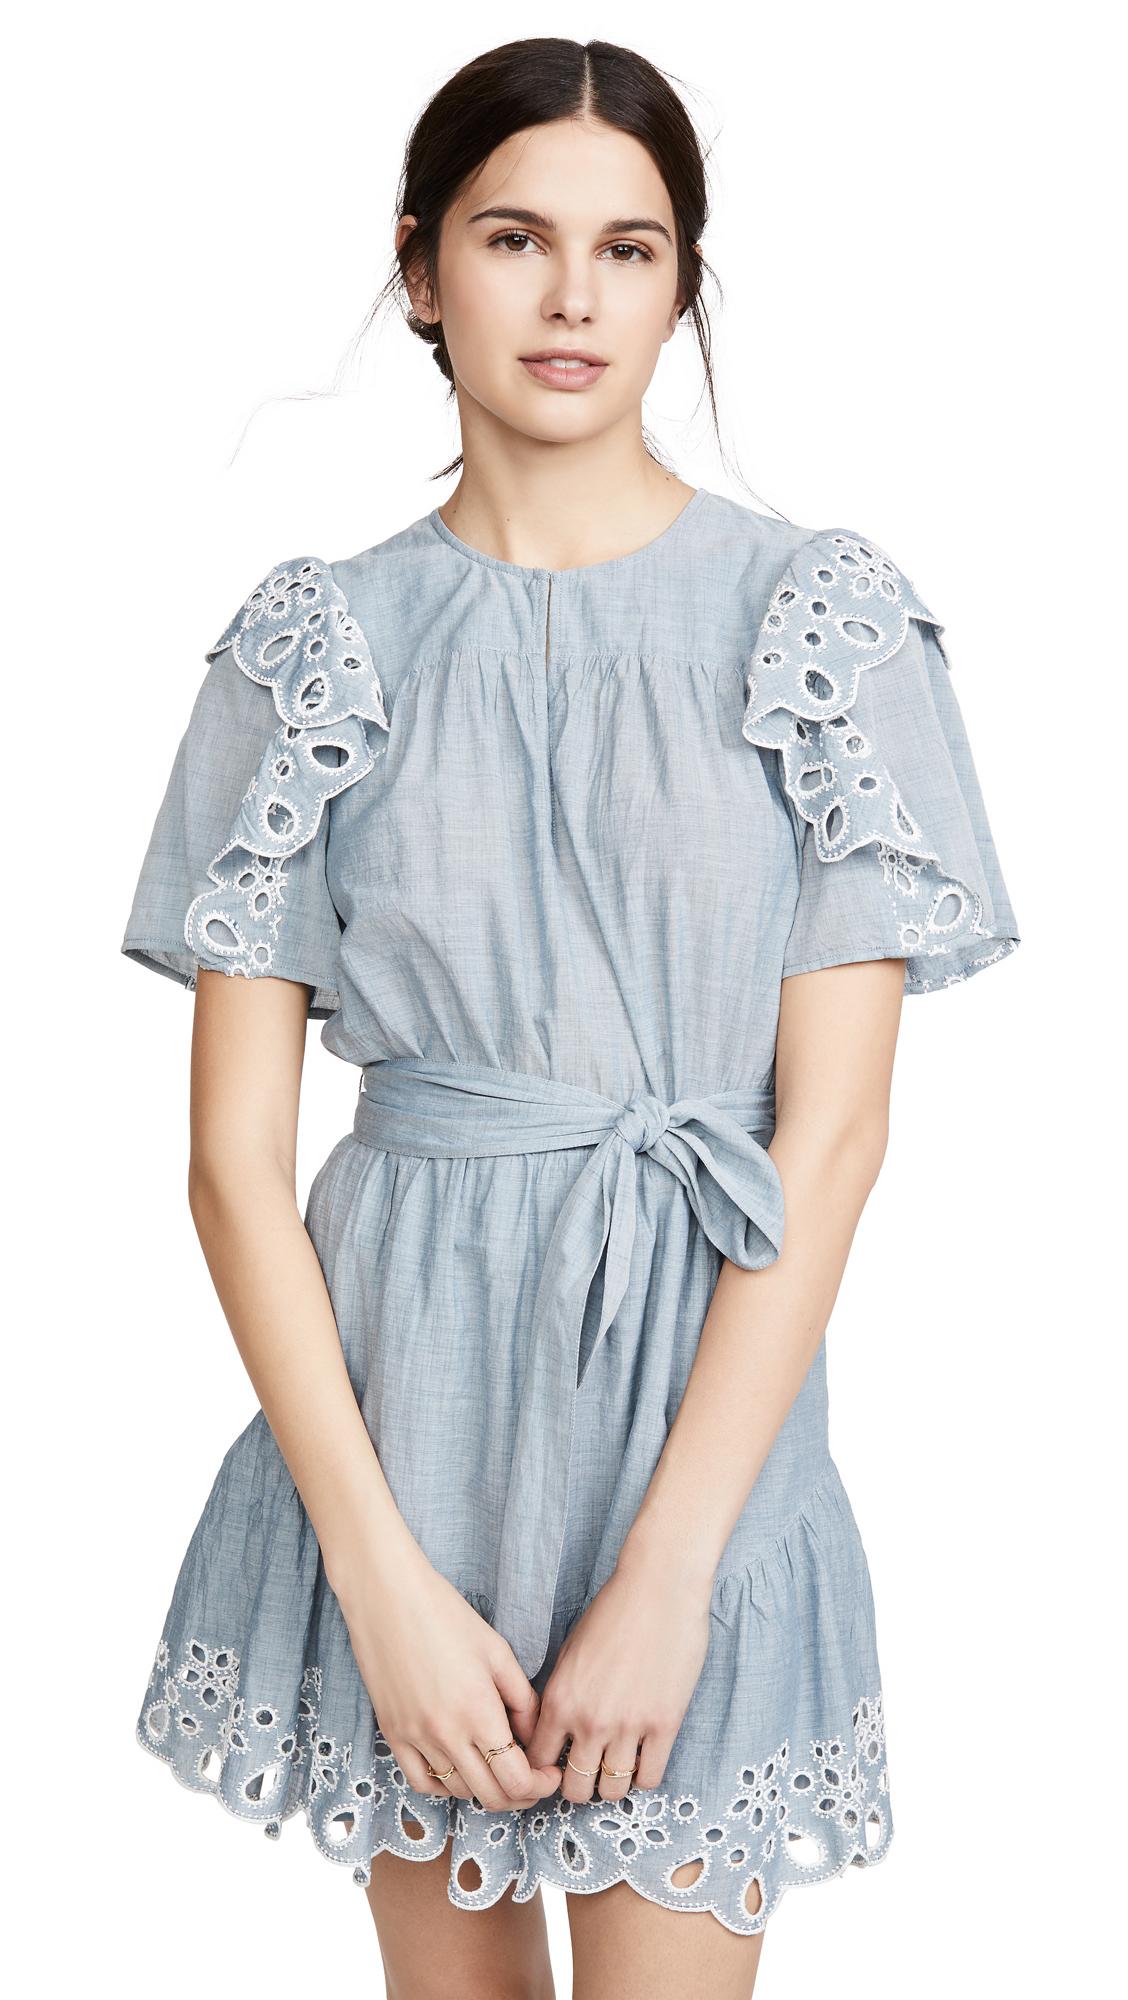 Joie Safia Dress - 55% Off Sale